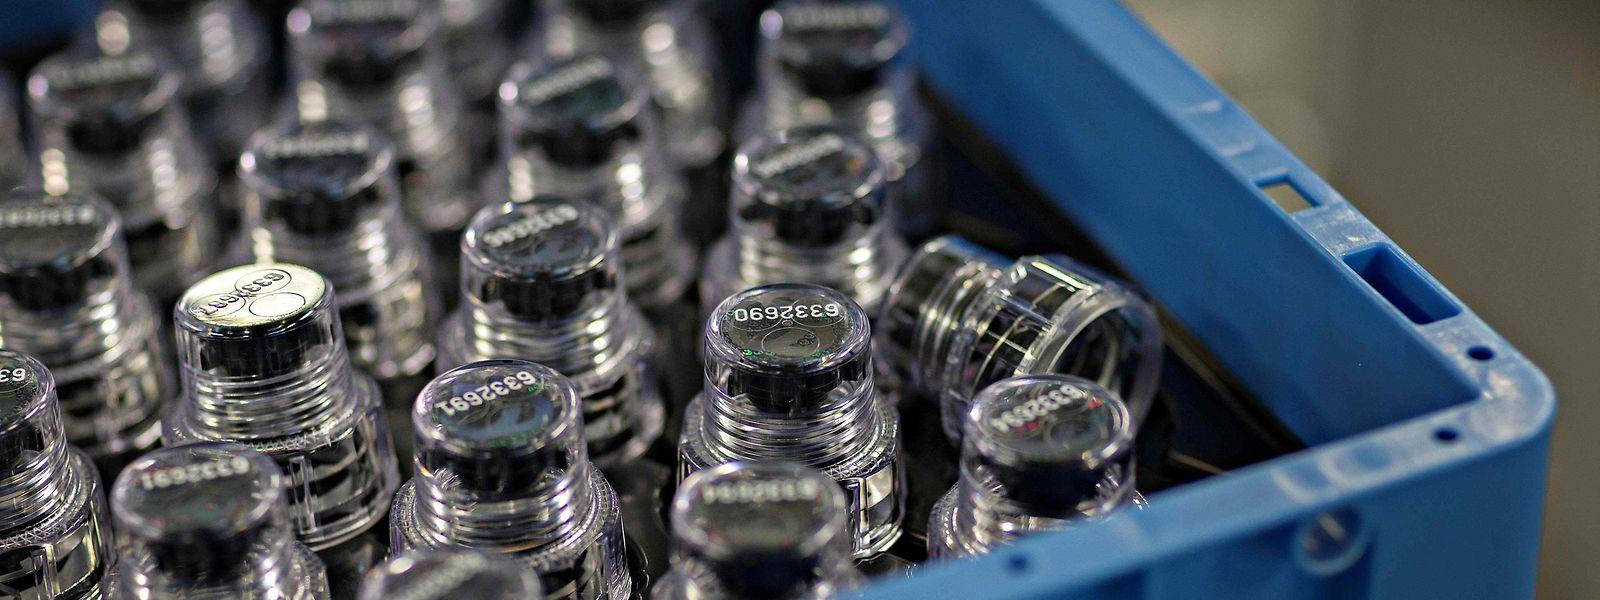 In Pyeongchang gehören Dopingkontrollen zum Alltag.